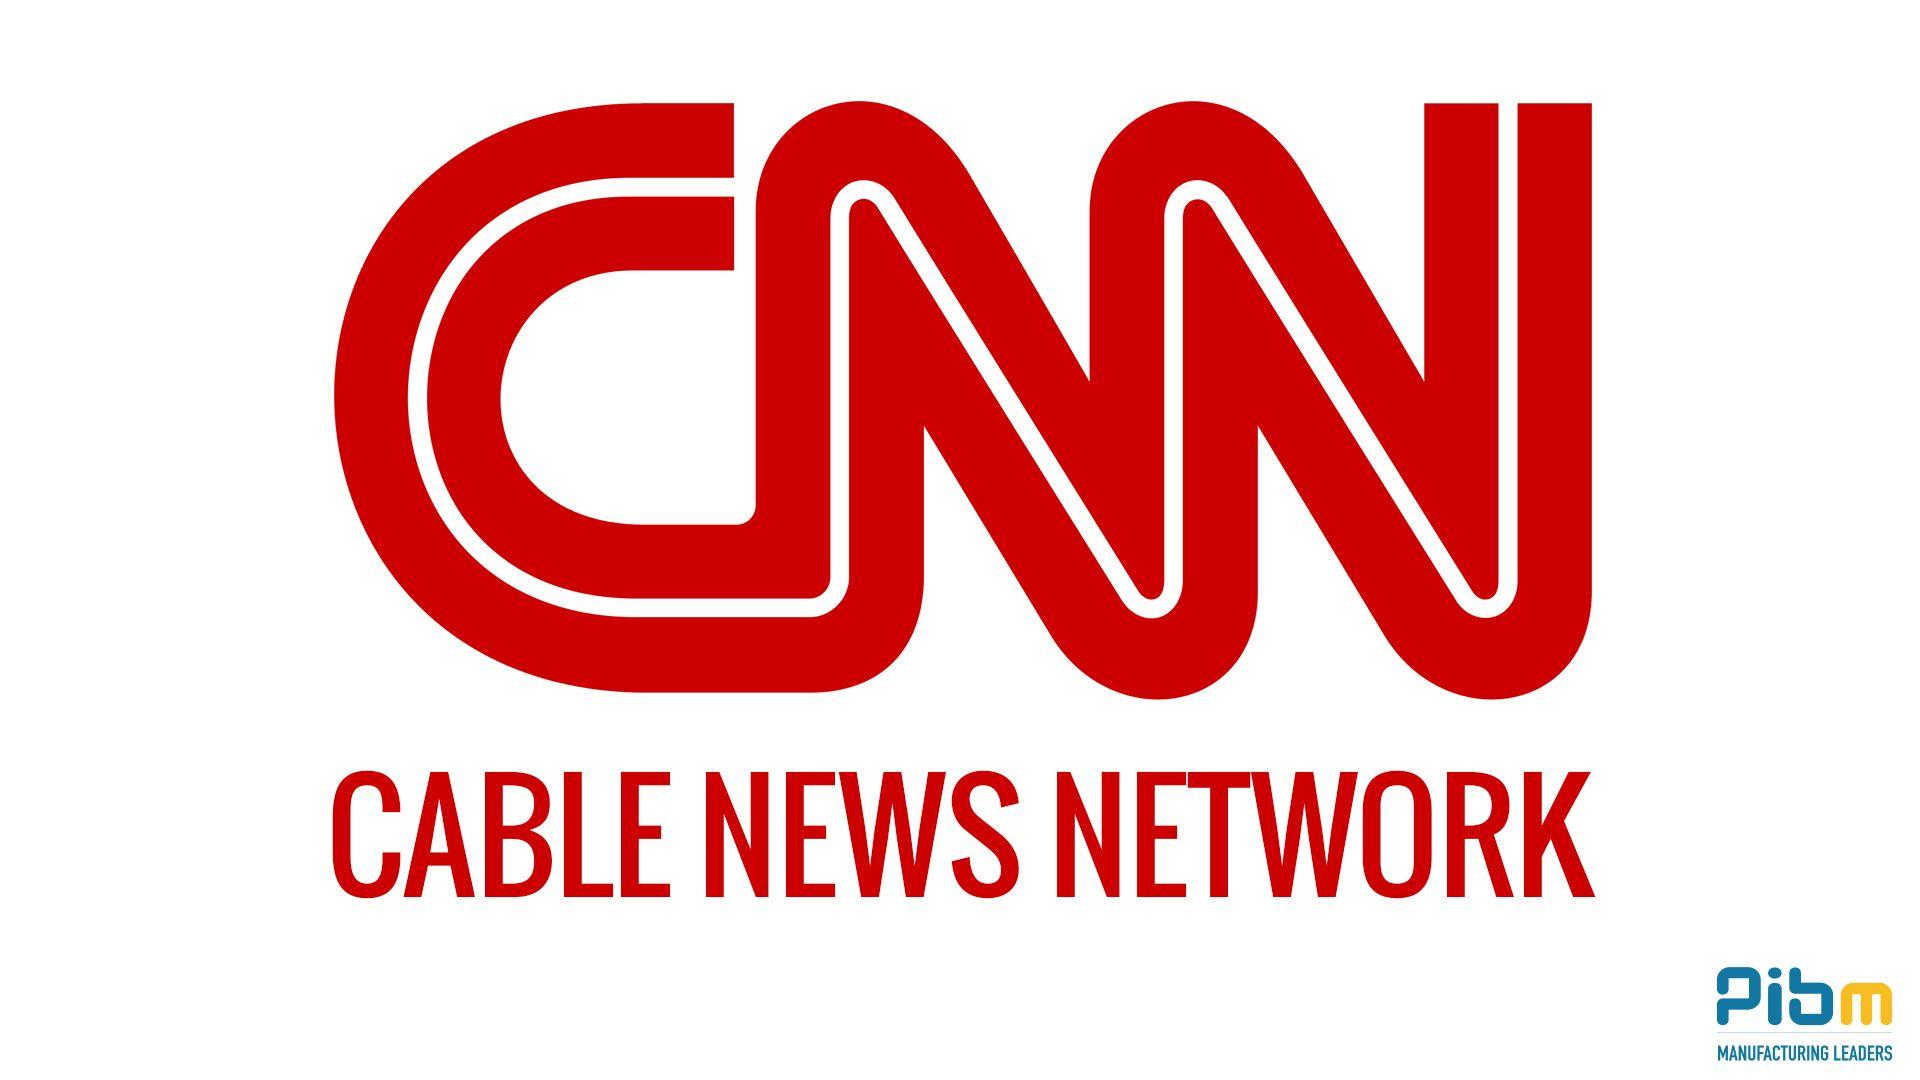 Cnn Is A 24 Hour American Cable News Channel So The Name Seems Appropriate Fake News Cnn Cnn International